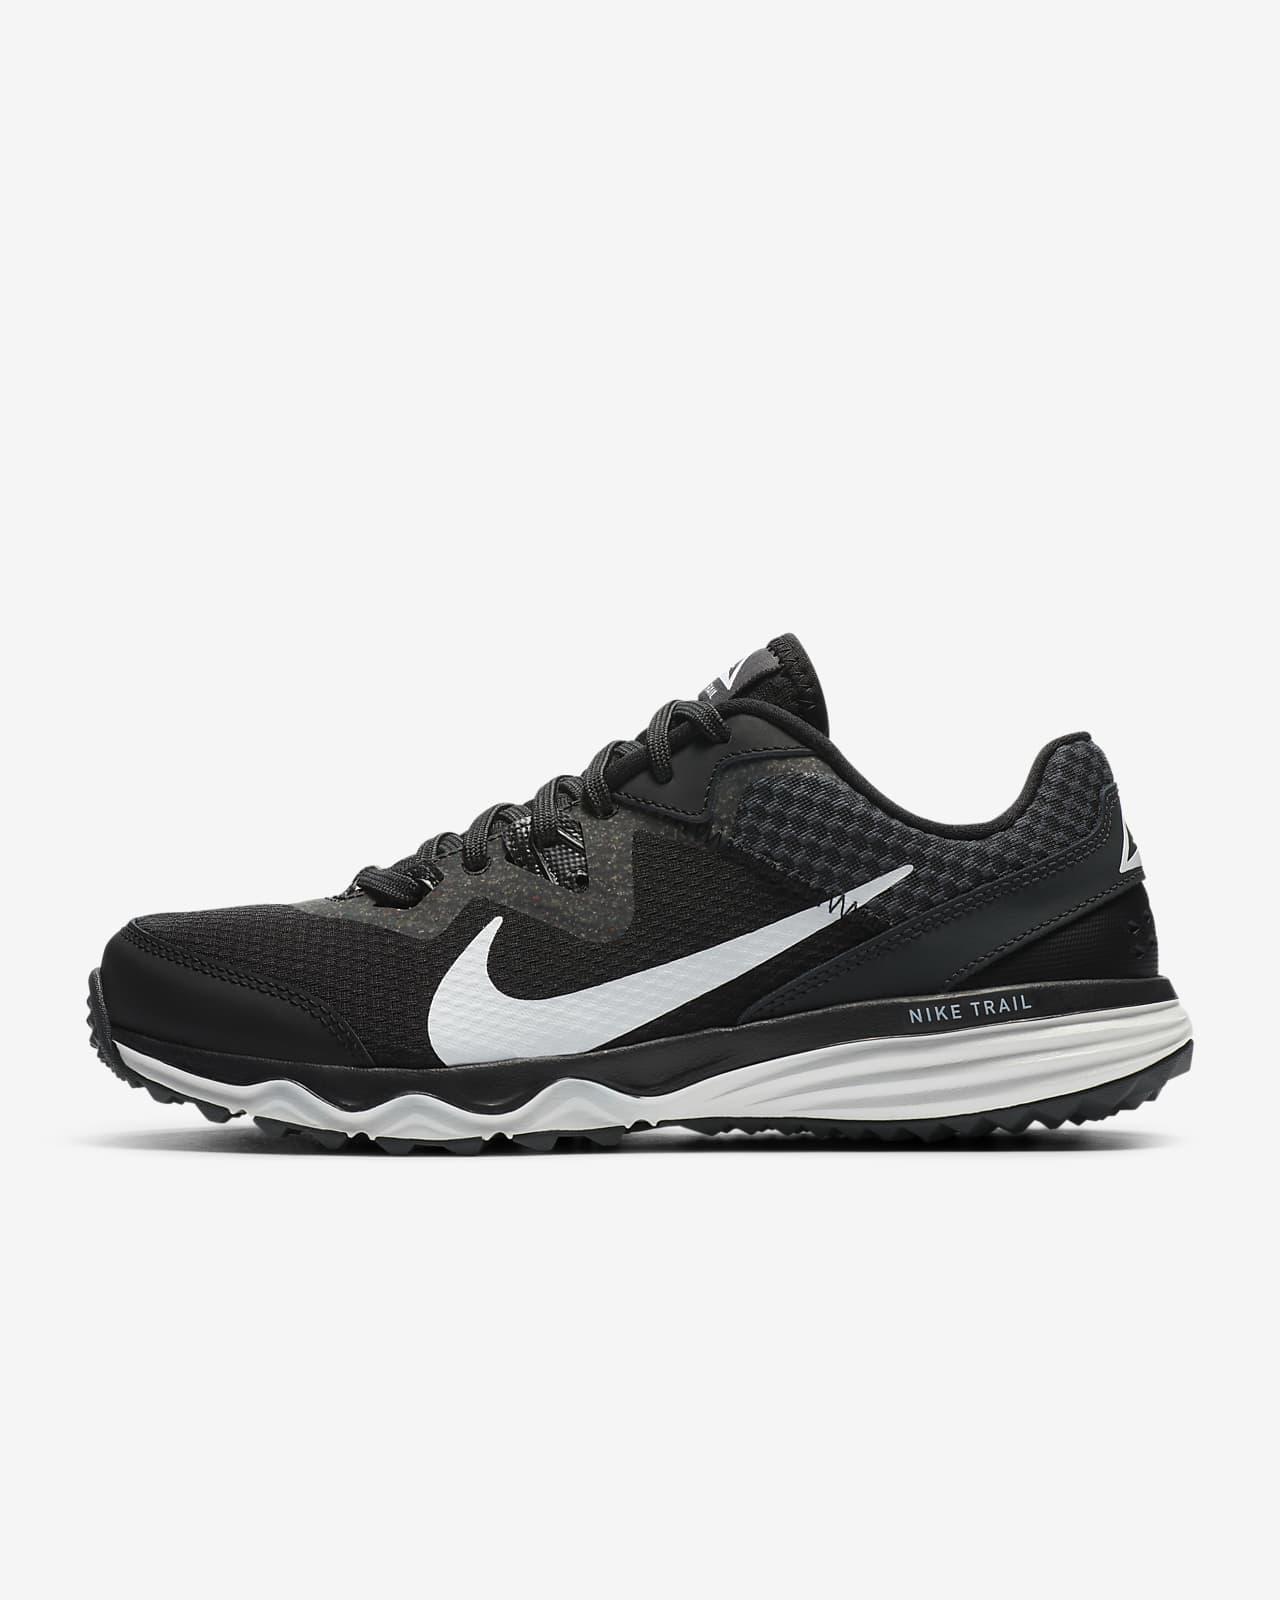 Nike Juniper Trail Women'S Trail Running Shoes